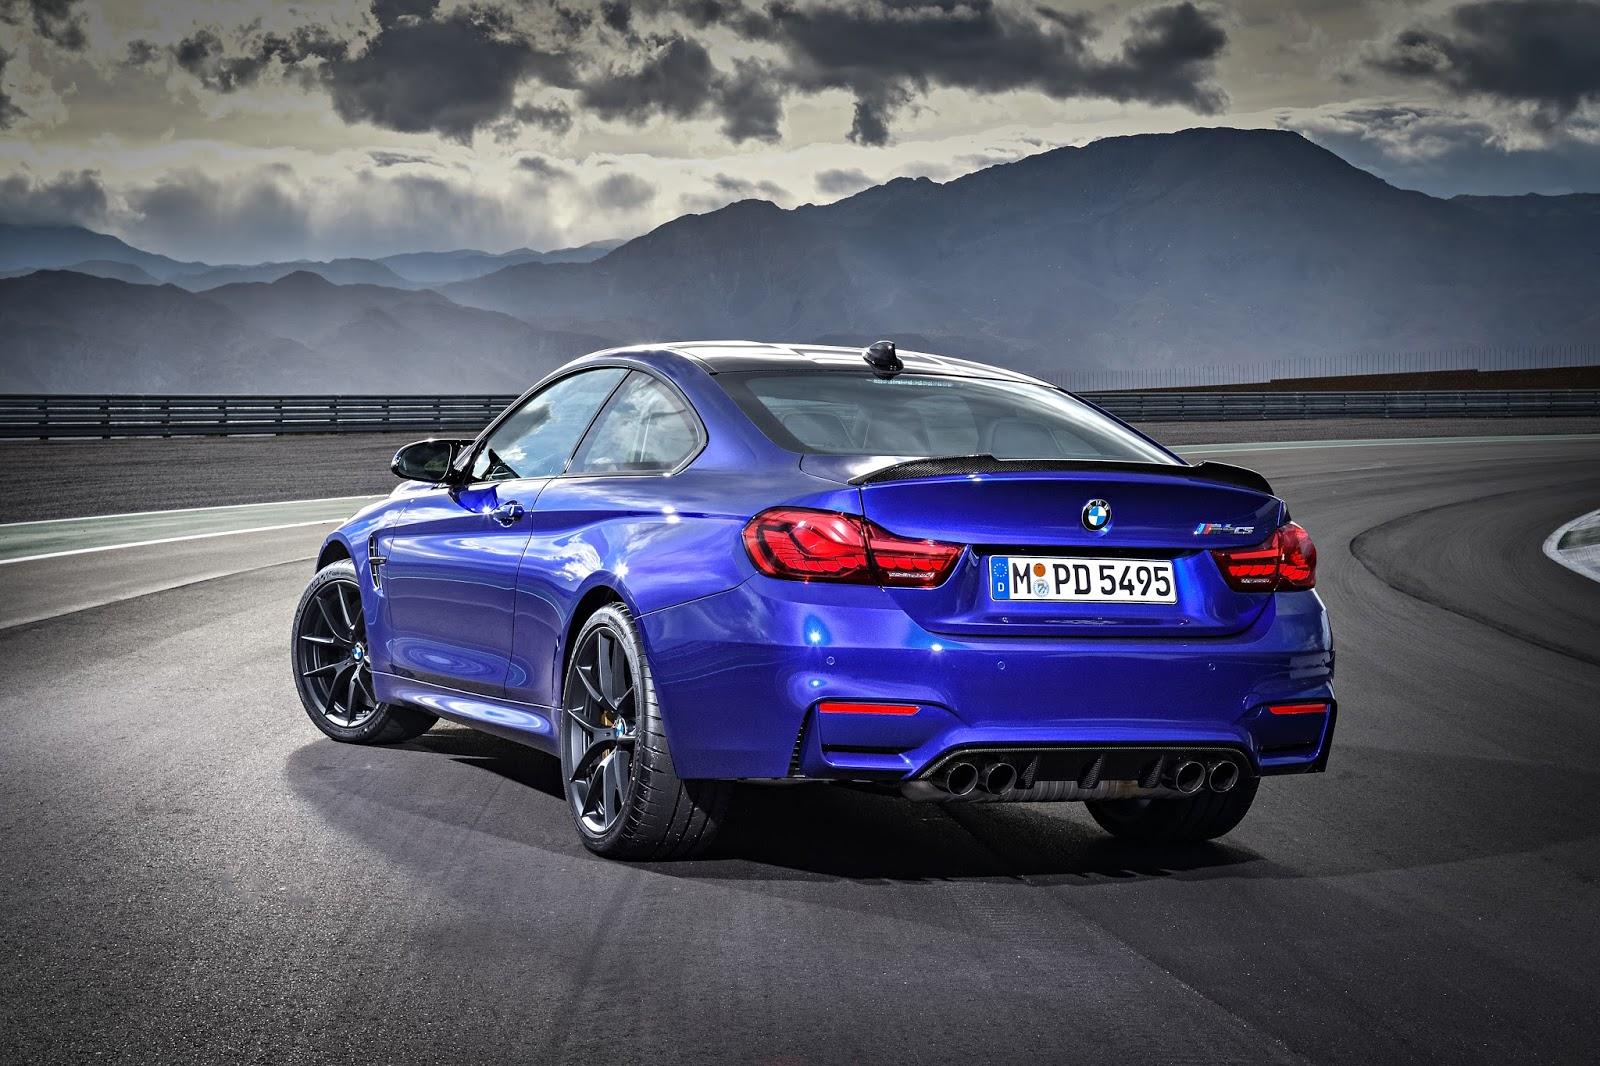 P90251022 highRes the new bmw m4 cs 04 1 Η περιορισμένης παραγωγής BMW M4 ClubSport δική σας με 116.900 ευρώ BMW, BMW M, BMW M4, BMW M4 CS, BMW Motorsport, clubsport, COUPE, Limited edition, supercars, supersport, videos, Περιορισμένης παραγωγής